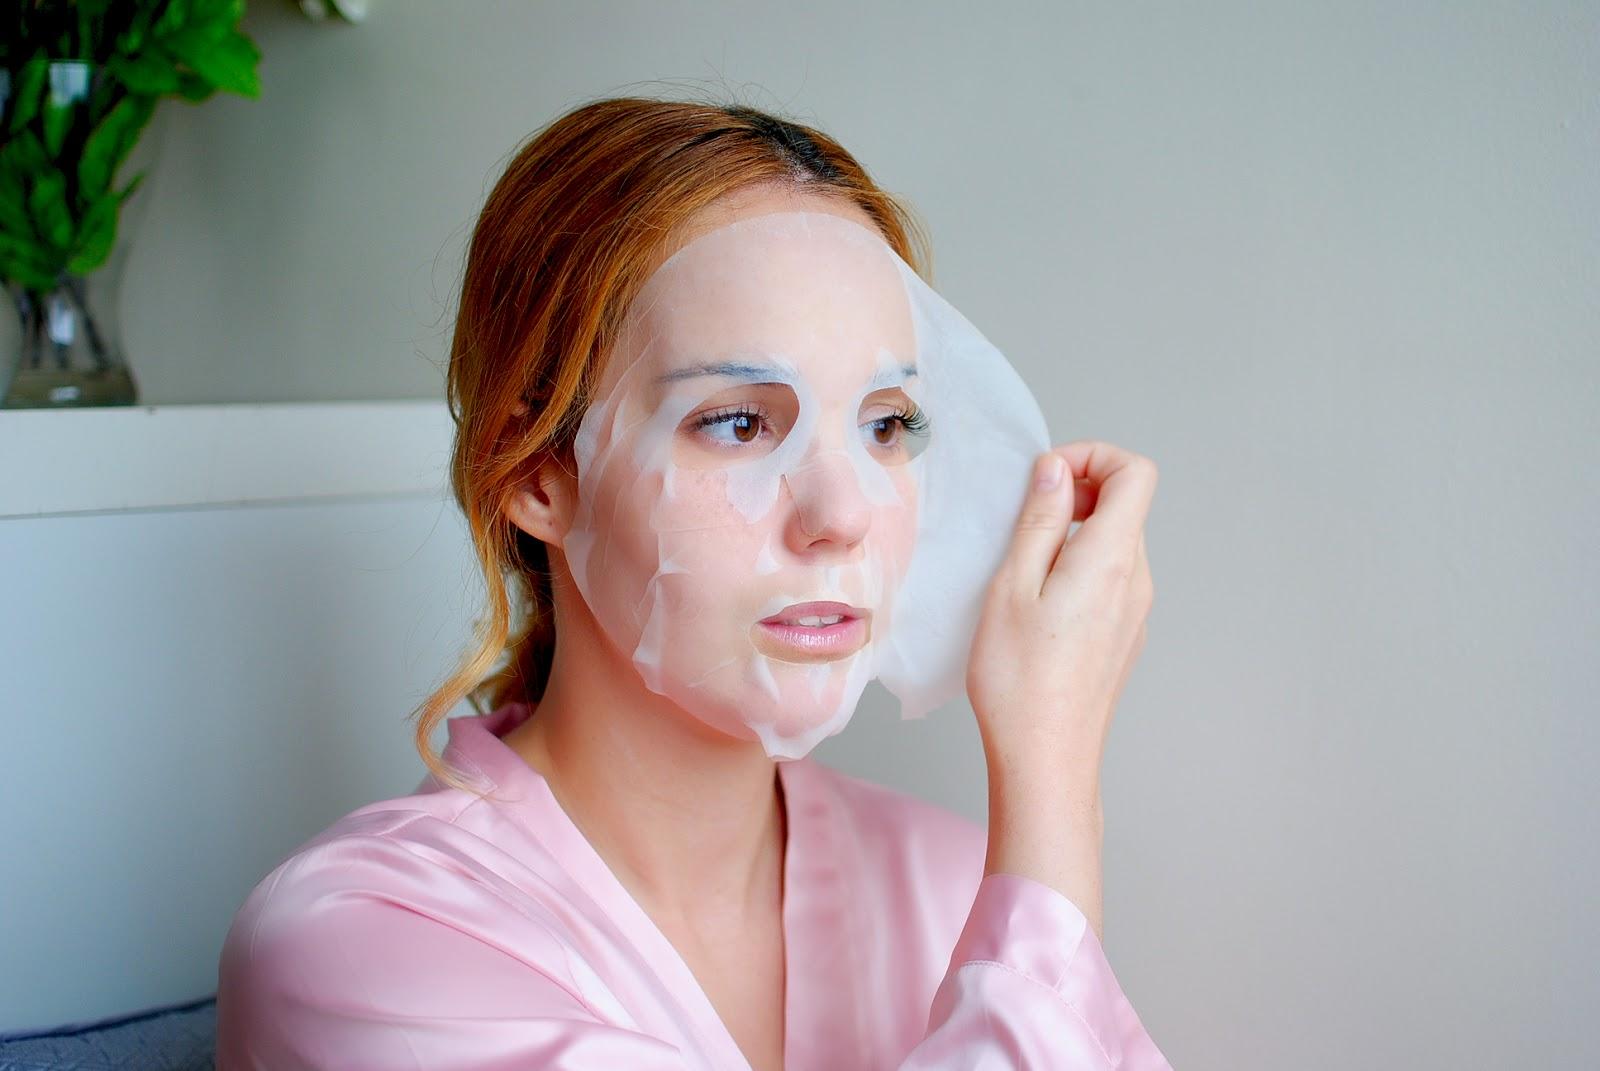 nery hdez, the skin lounge, beauty , belleza, tratamiento belleza,